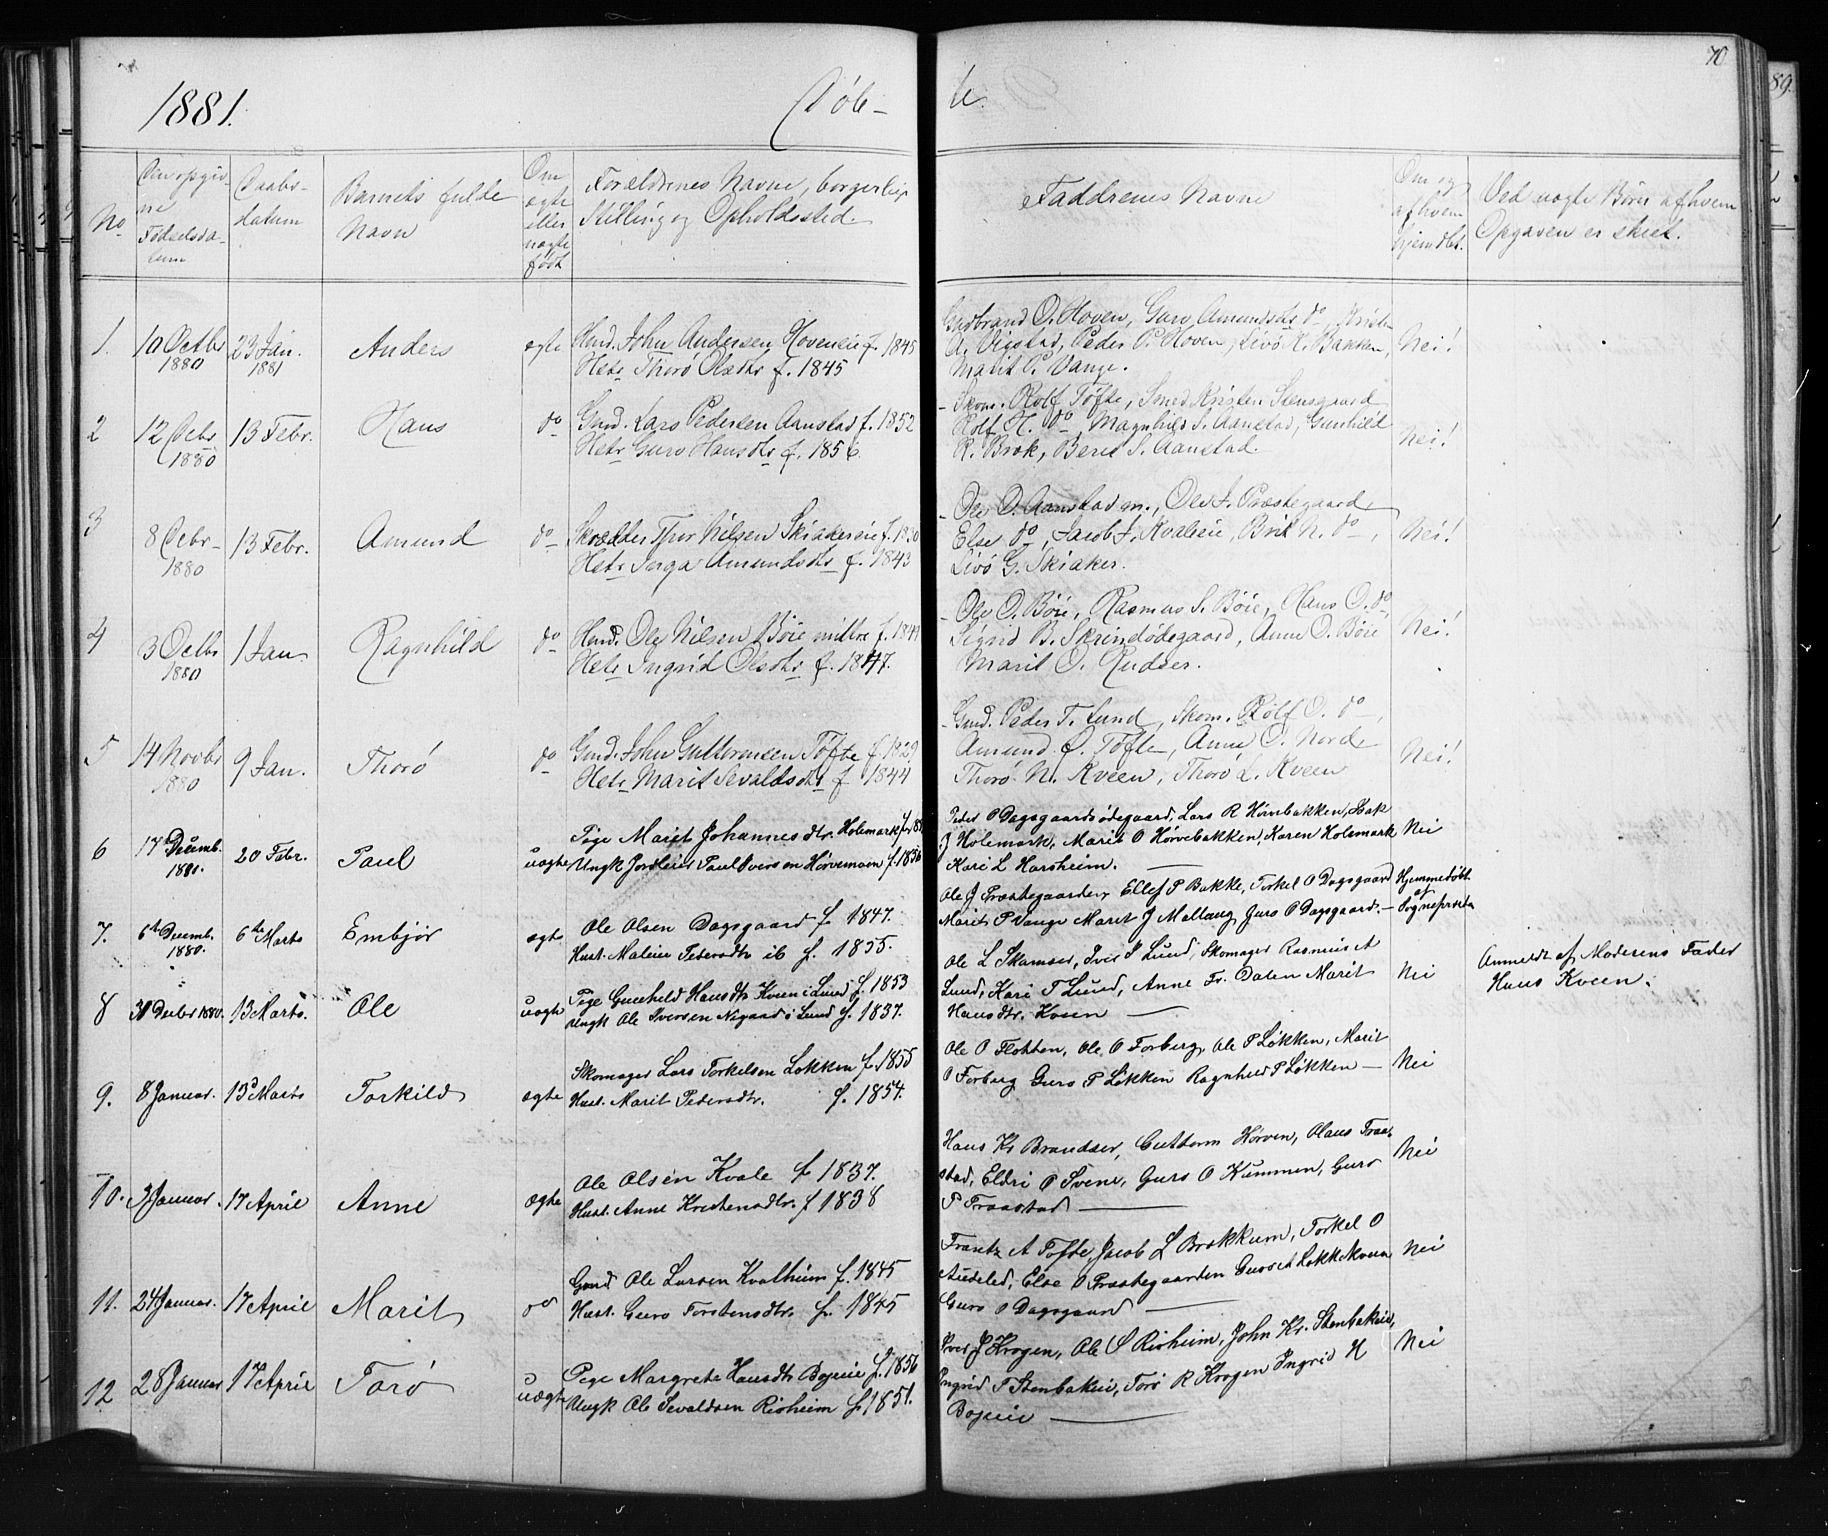 SAH, Skjåk prestekontor, Klokkerbok nr. 1, 1865-1893, s. 70